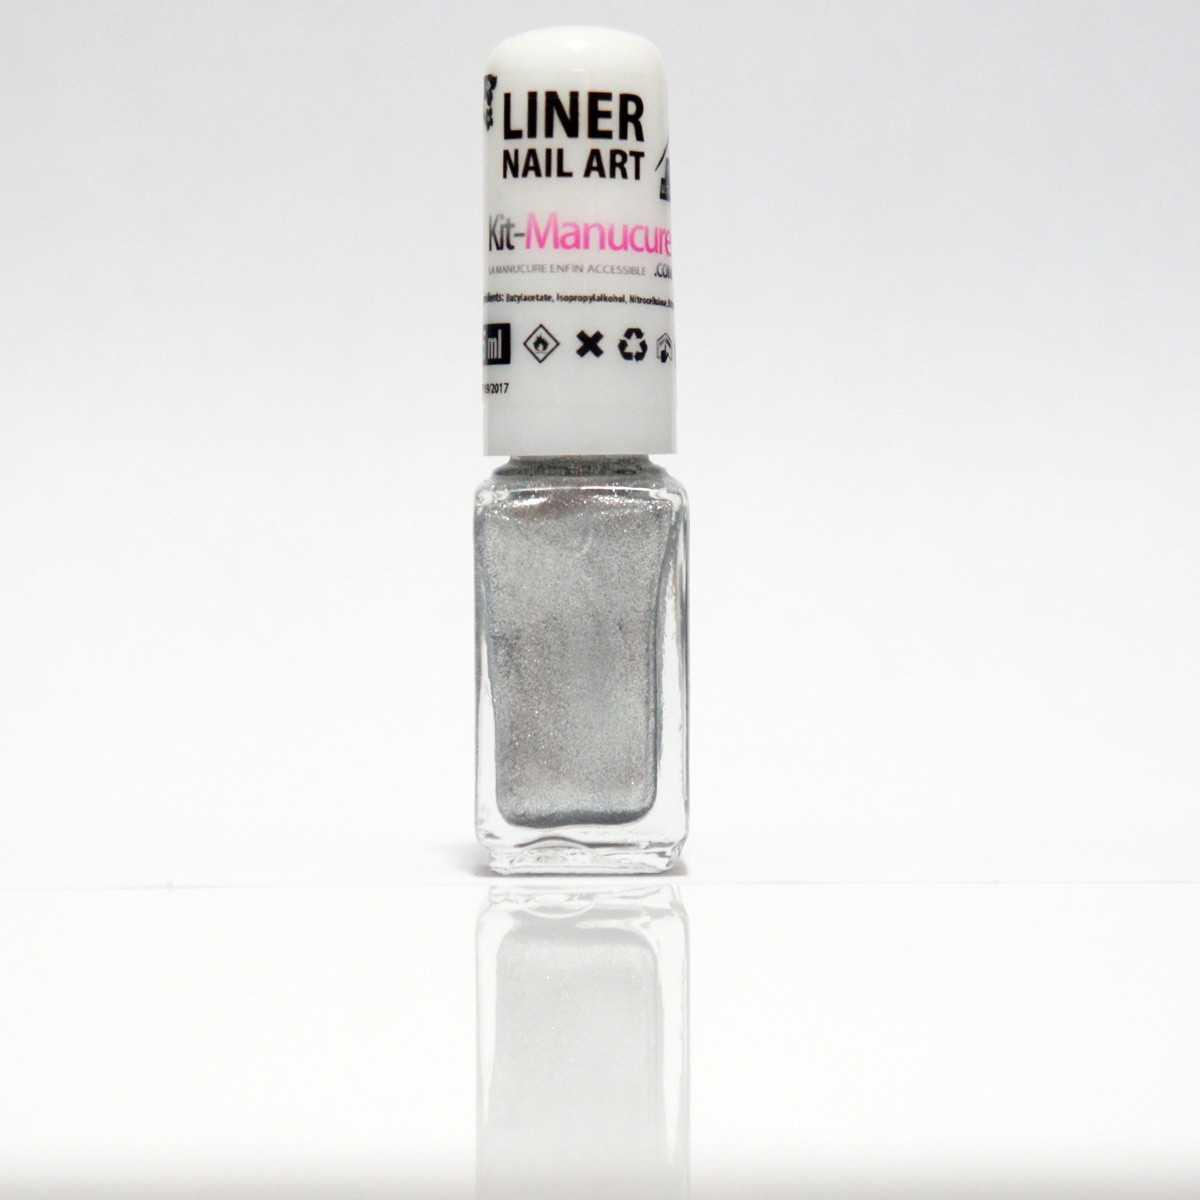 https://www.kit-manucure.com/289-thickbox_default/liner-nail-art-argent-.jpg